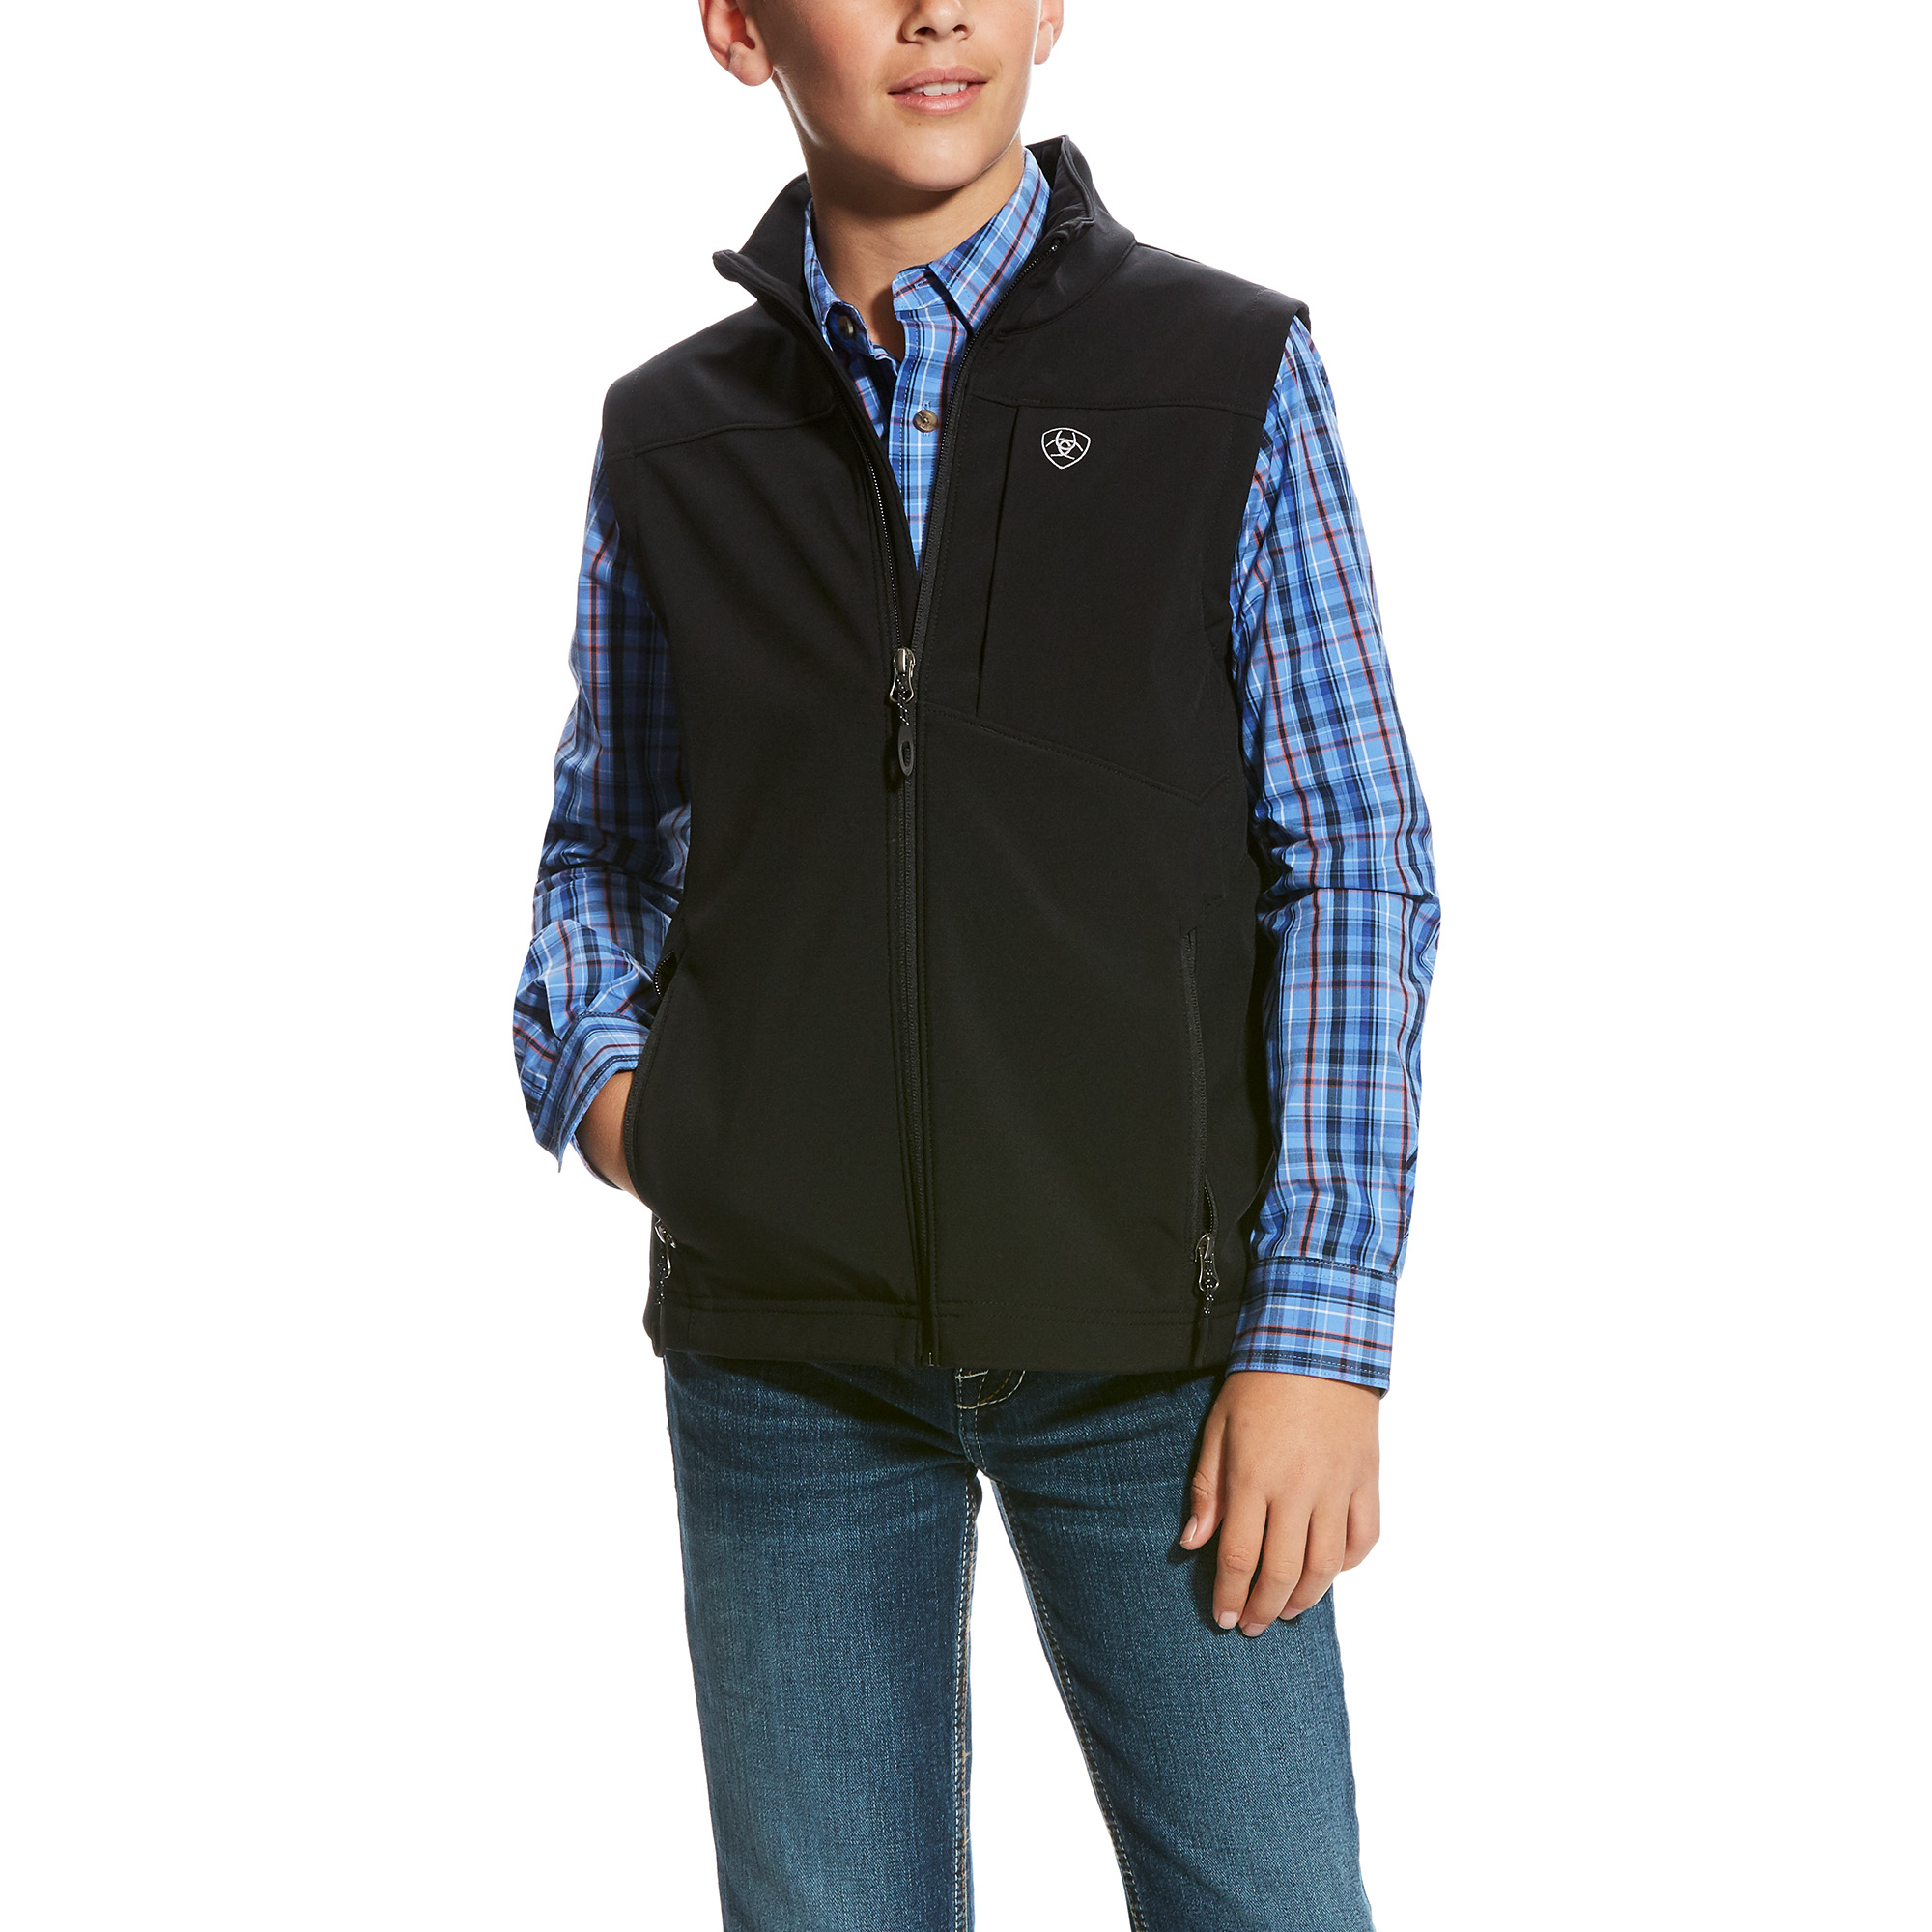 Vernon 2.0 Softshell Vest from Ariat